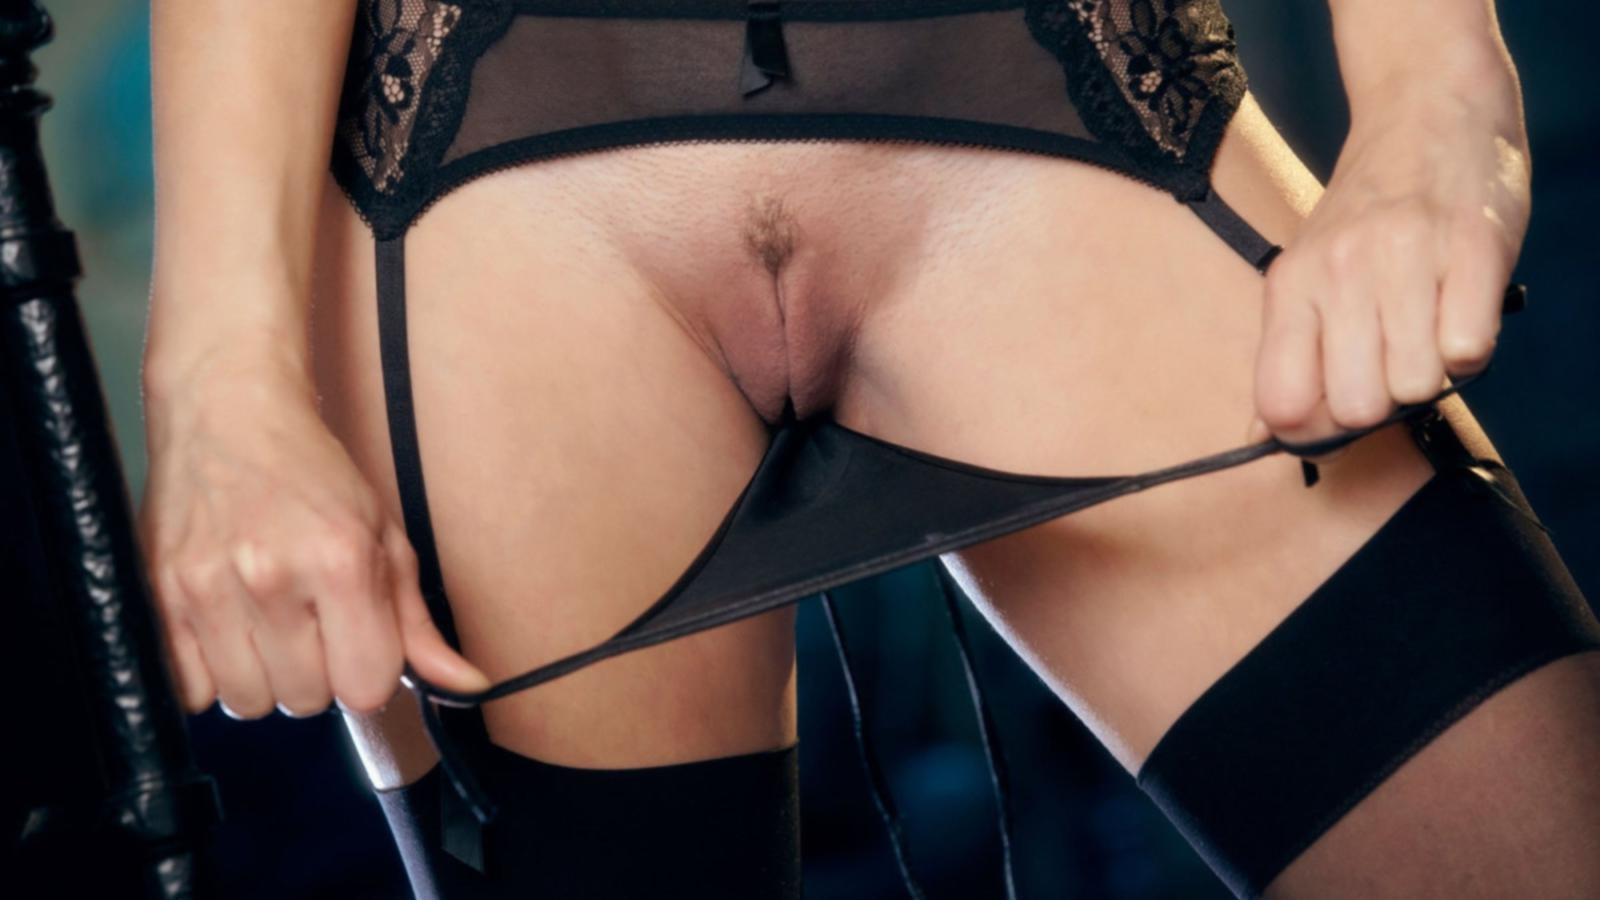 bbw blonde missionary sex gifs